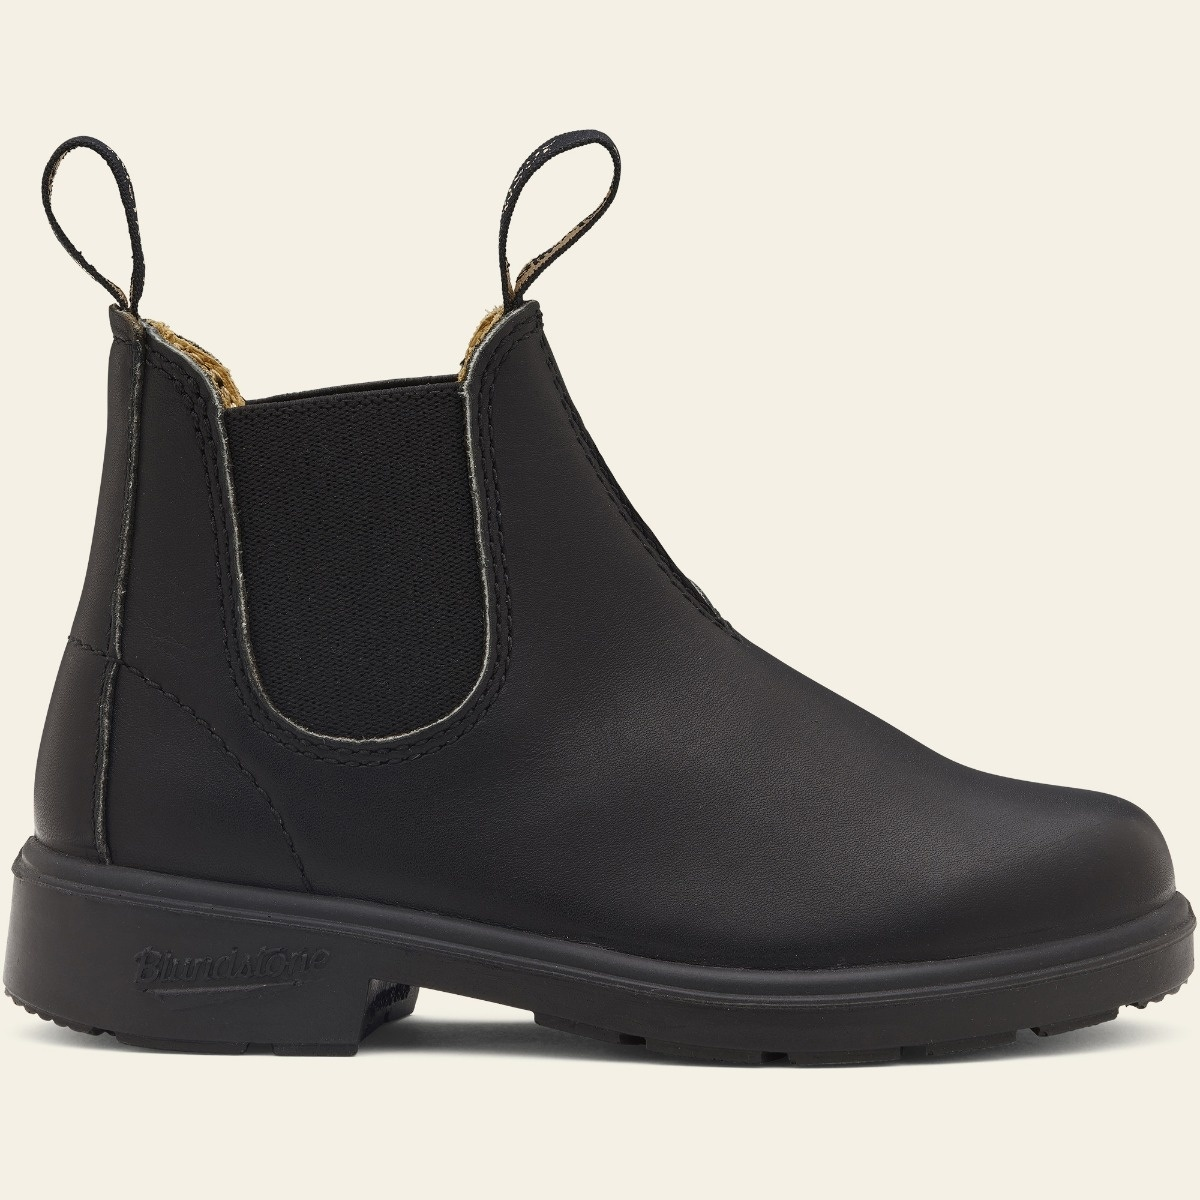 Black Full Grain Leather Chelsea Boots